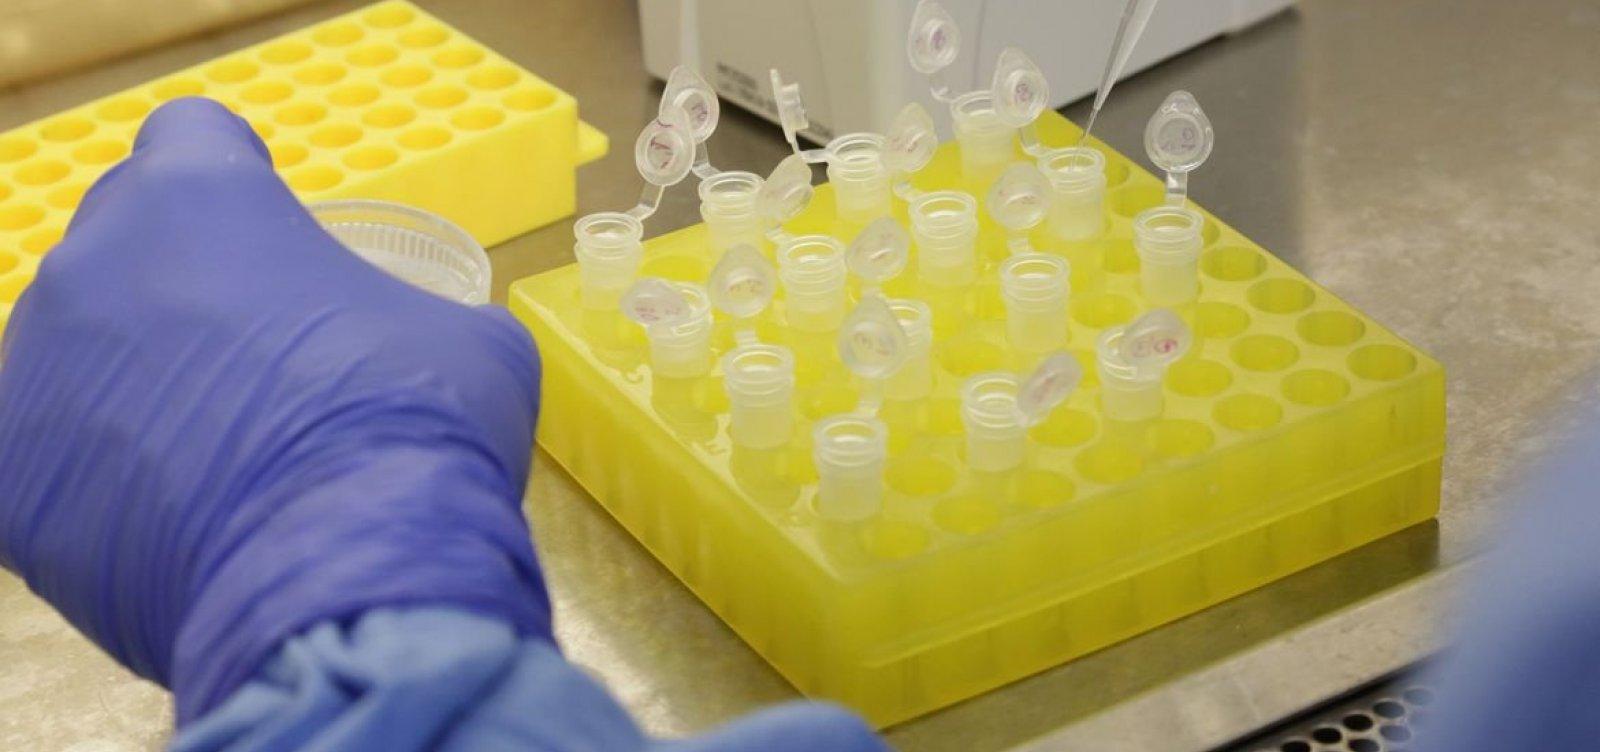 Bahia registra 129 novos casos de coronavírus; total sobe para 1193